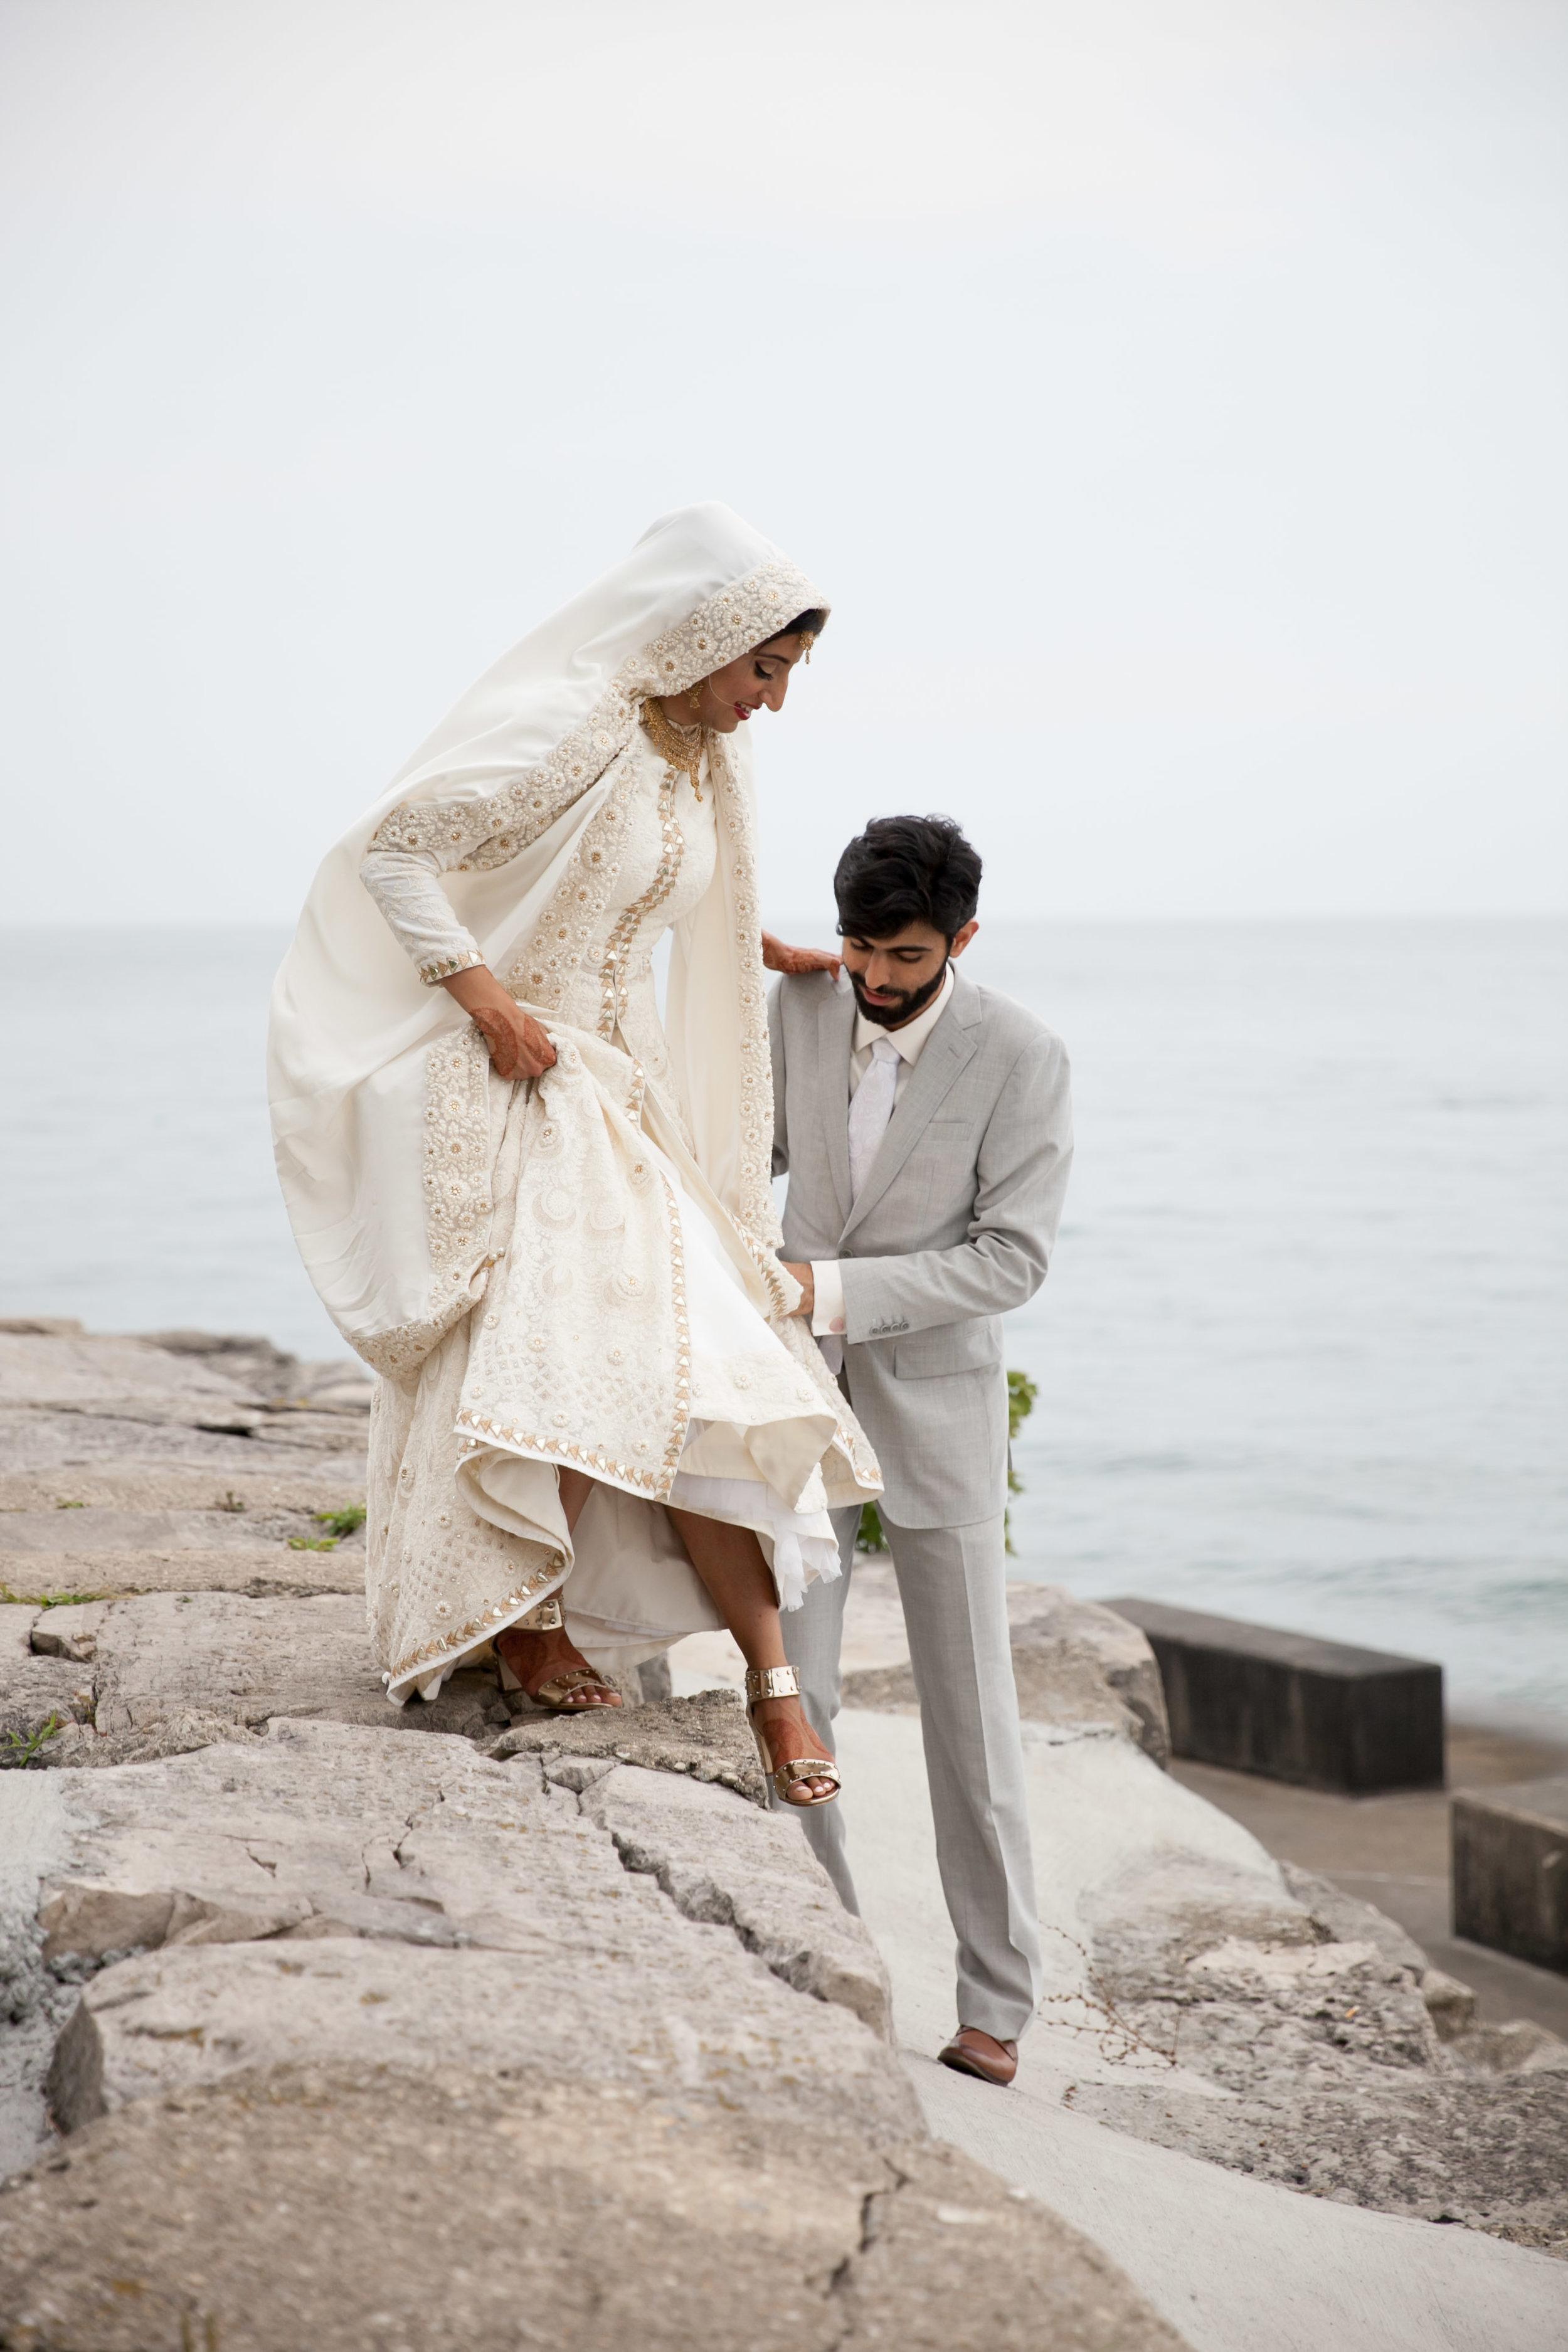 LisaDiederichPhotography_Maryam&Salman-128.jpg